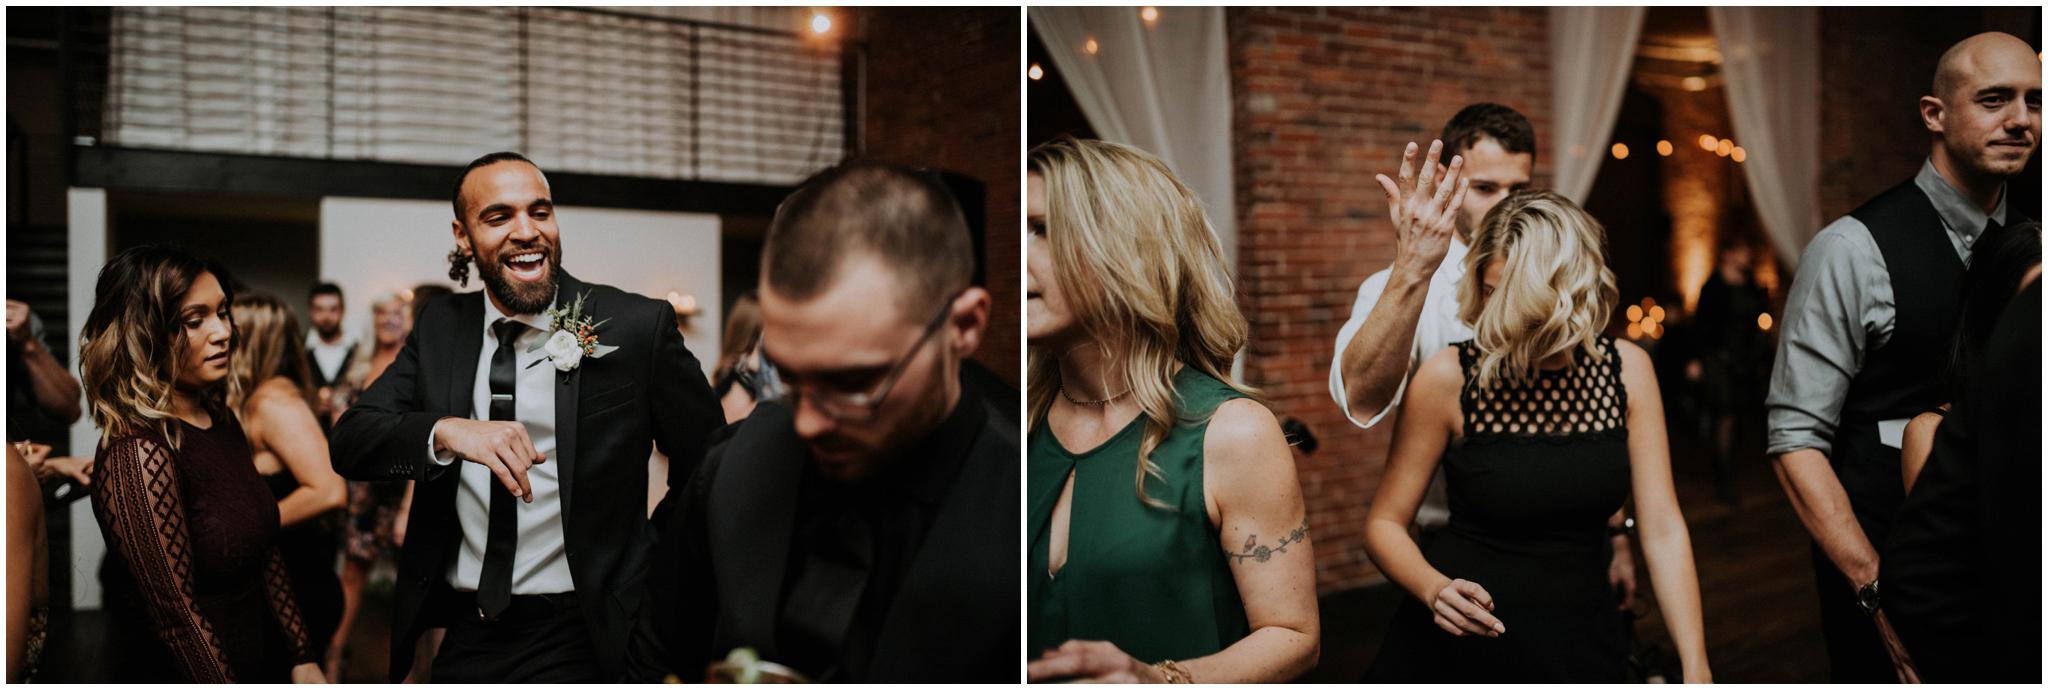 danny+mackenzie+downtown-seattle-axis-wedding-seattle-photographer-118.jpg